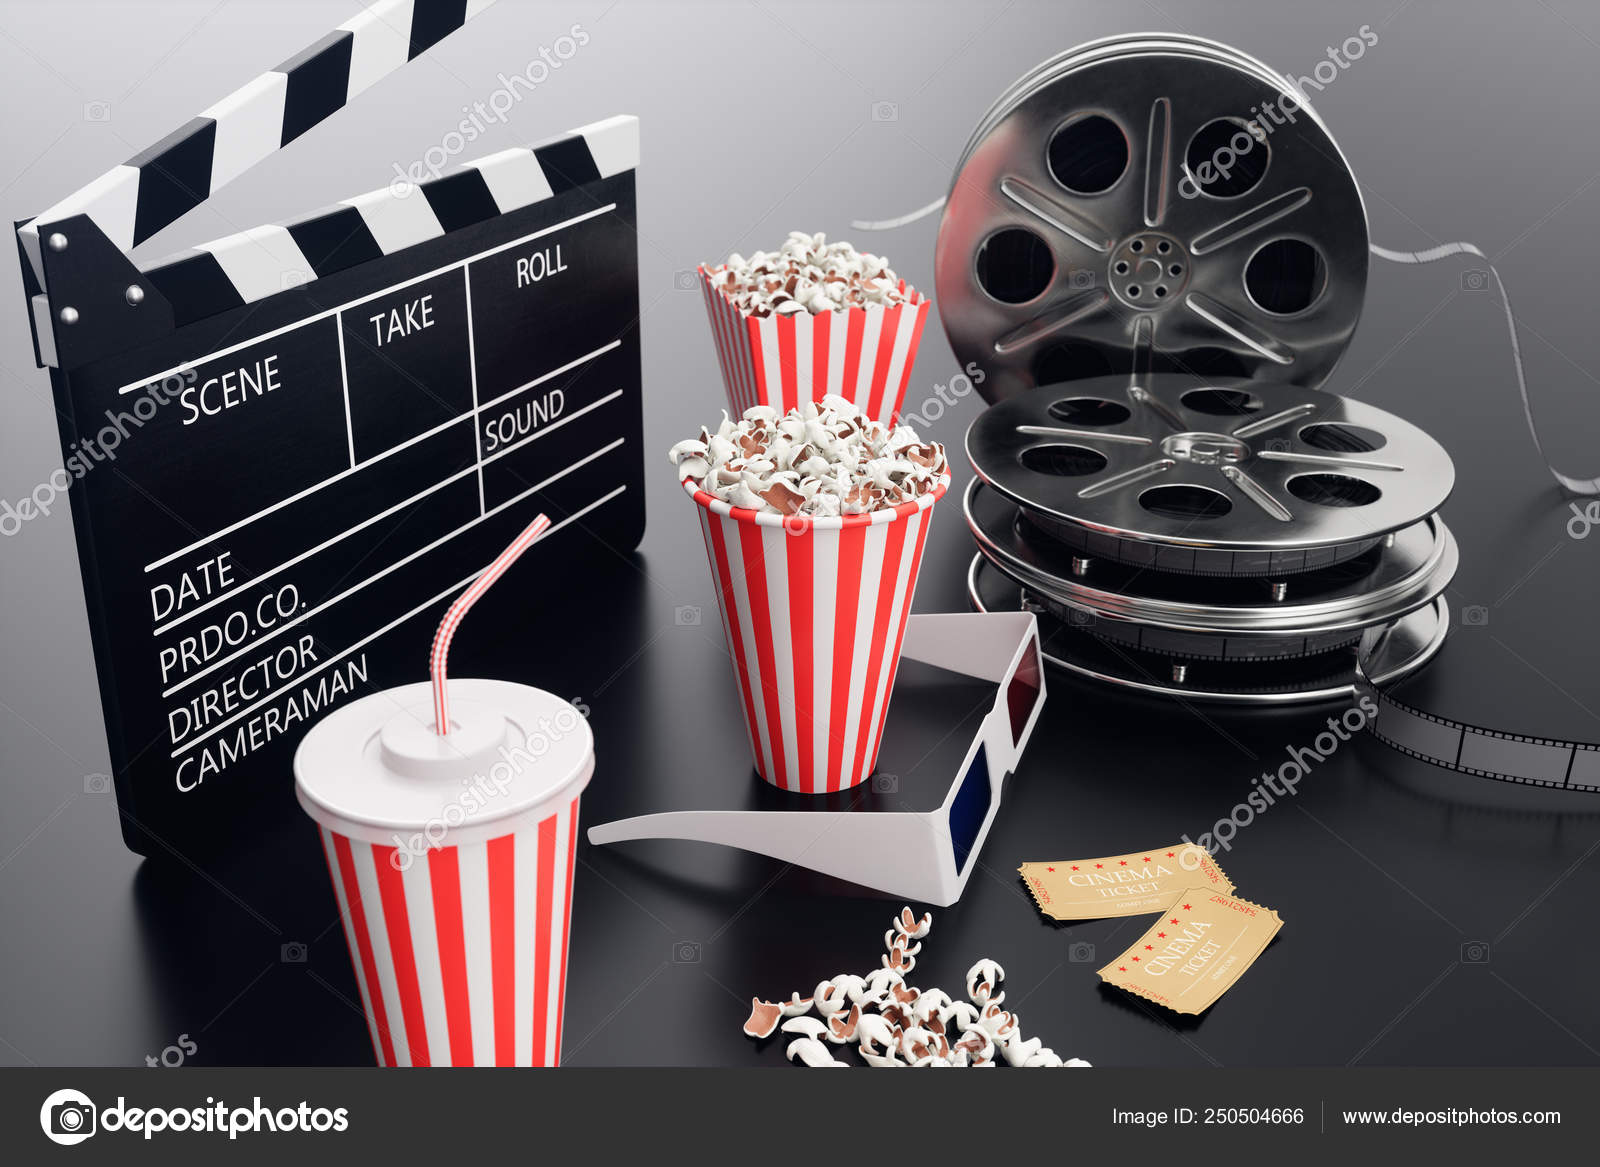 kinofilmeanschauen.de